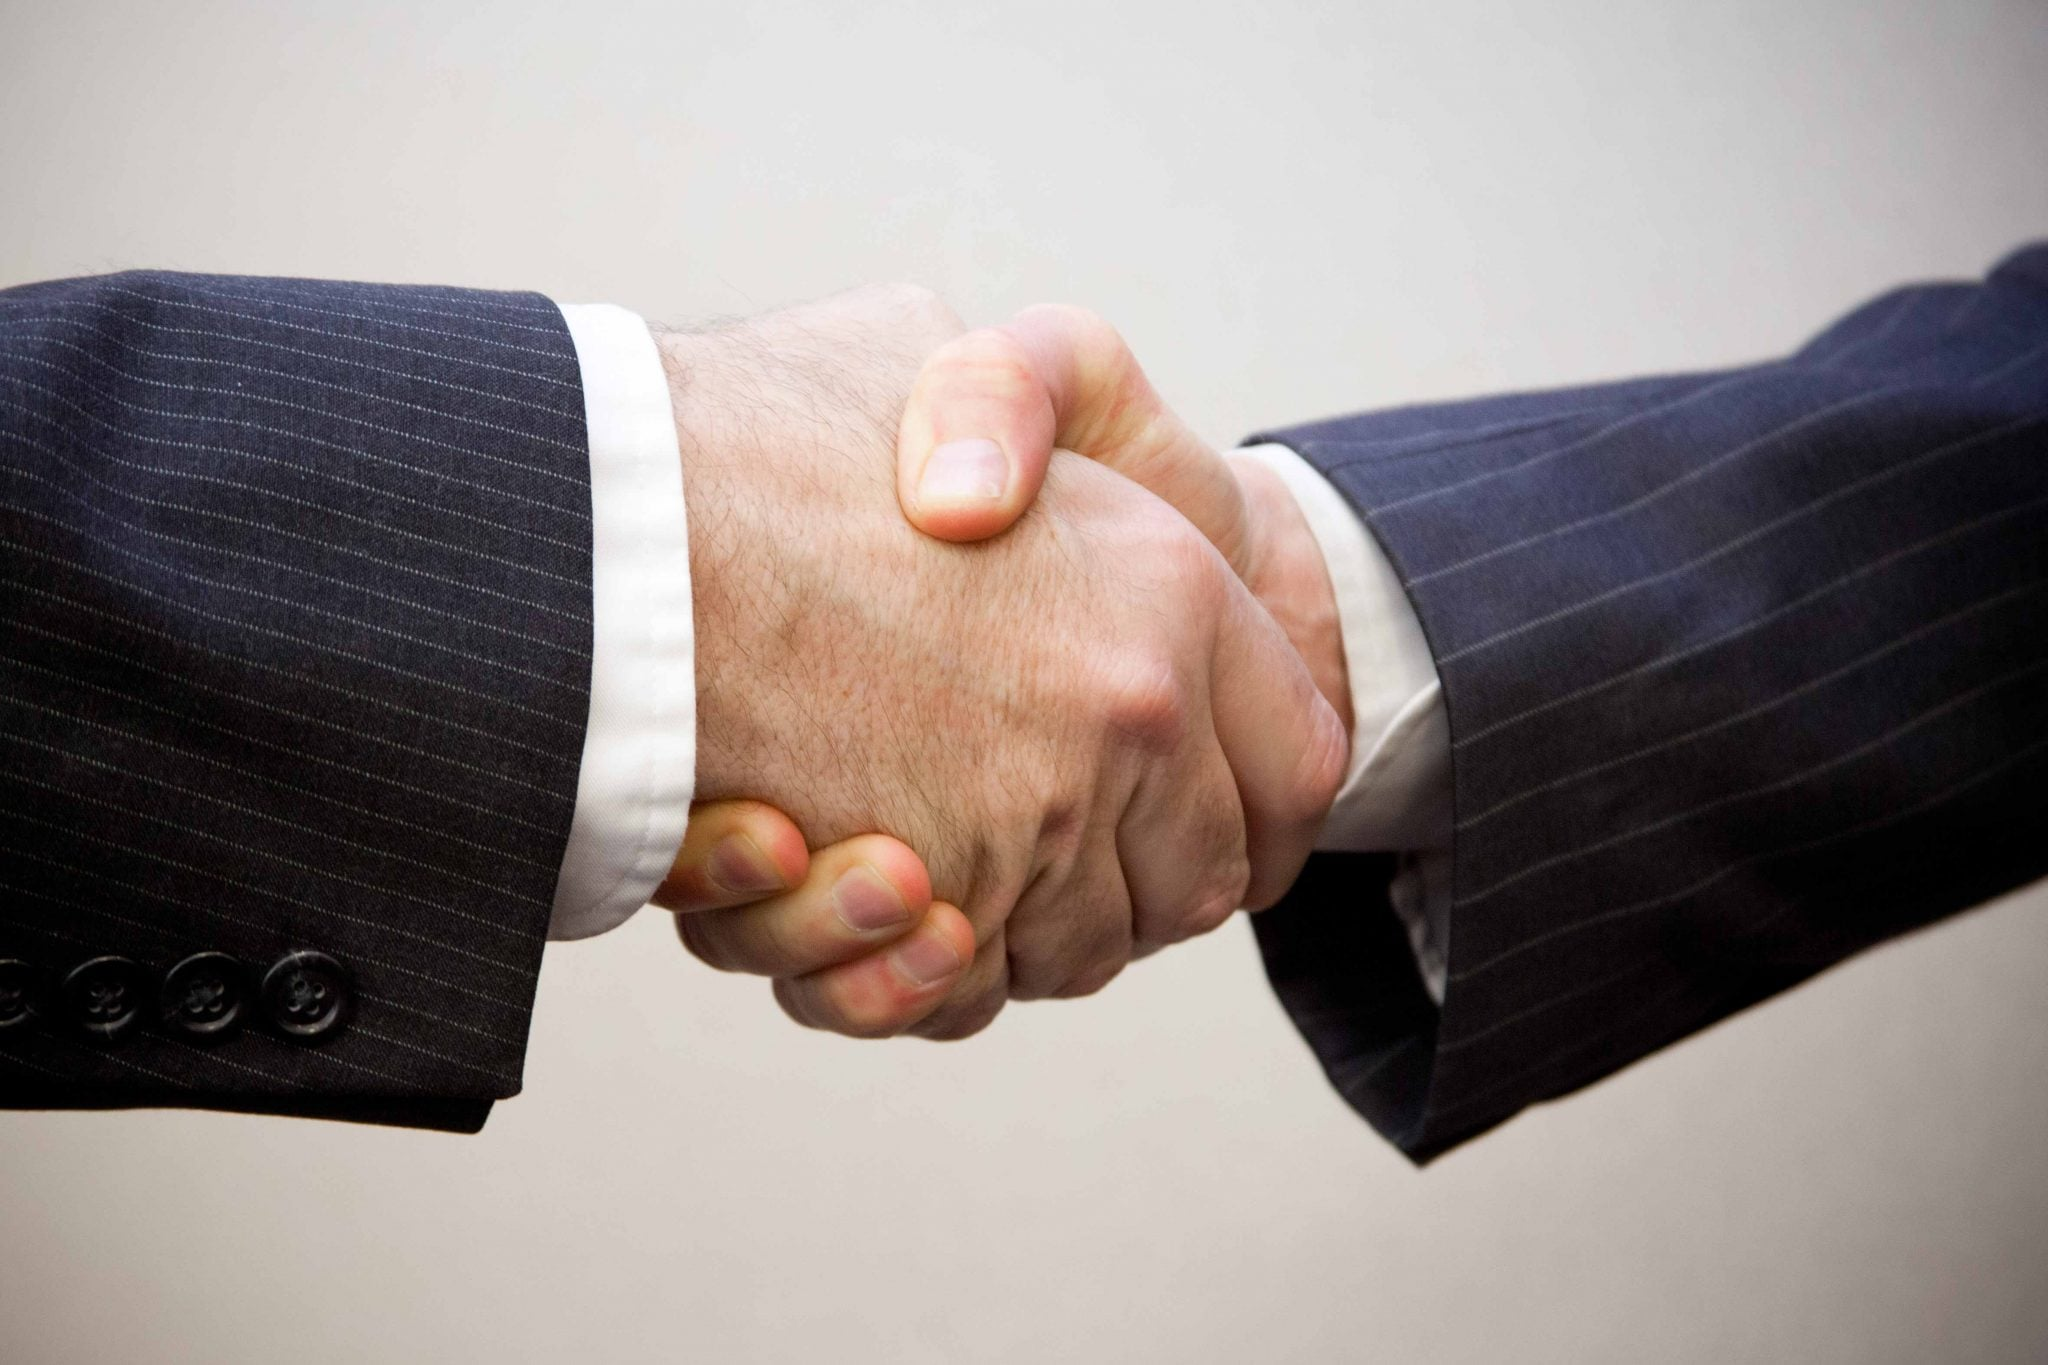 NASPO and NASCIO: States Bringing IT and Procurement Together